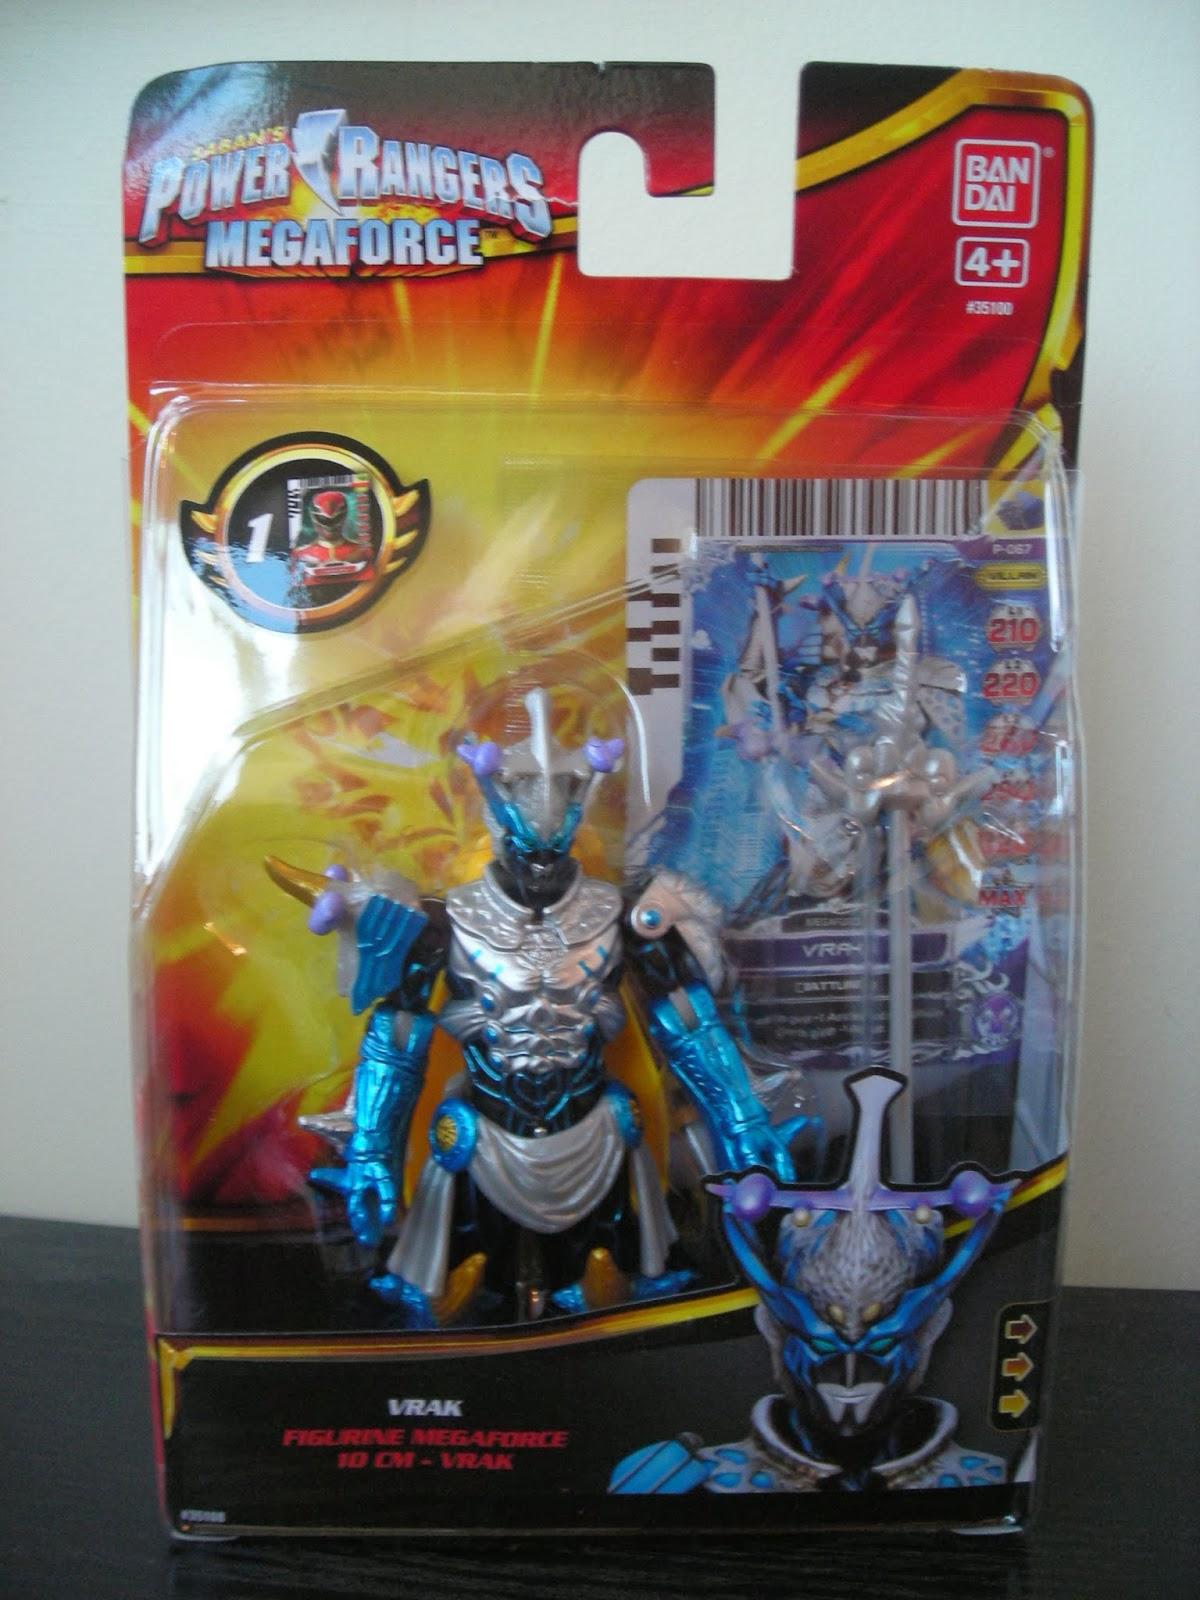 My shiny toy robots toybox review power rangers - Robot power rangers megaforce ...